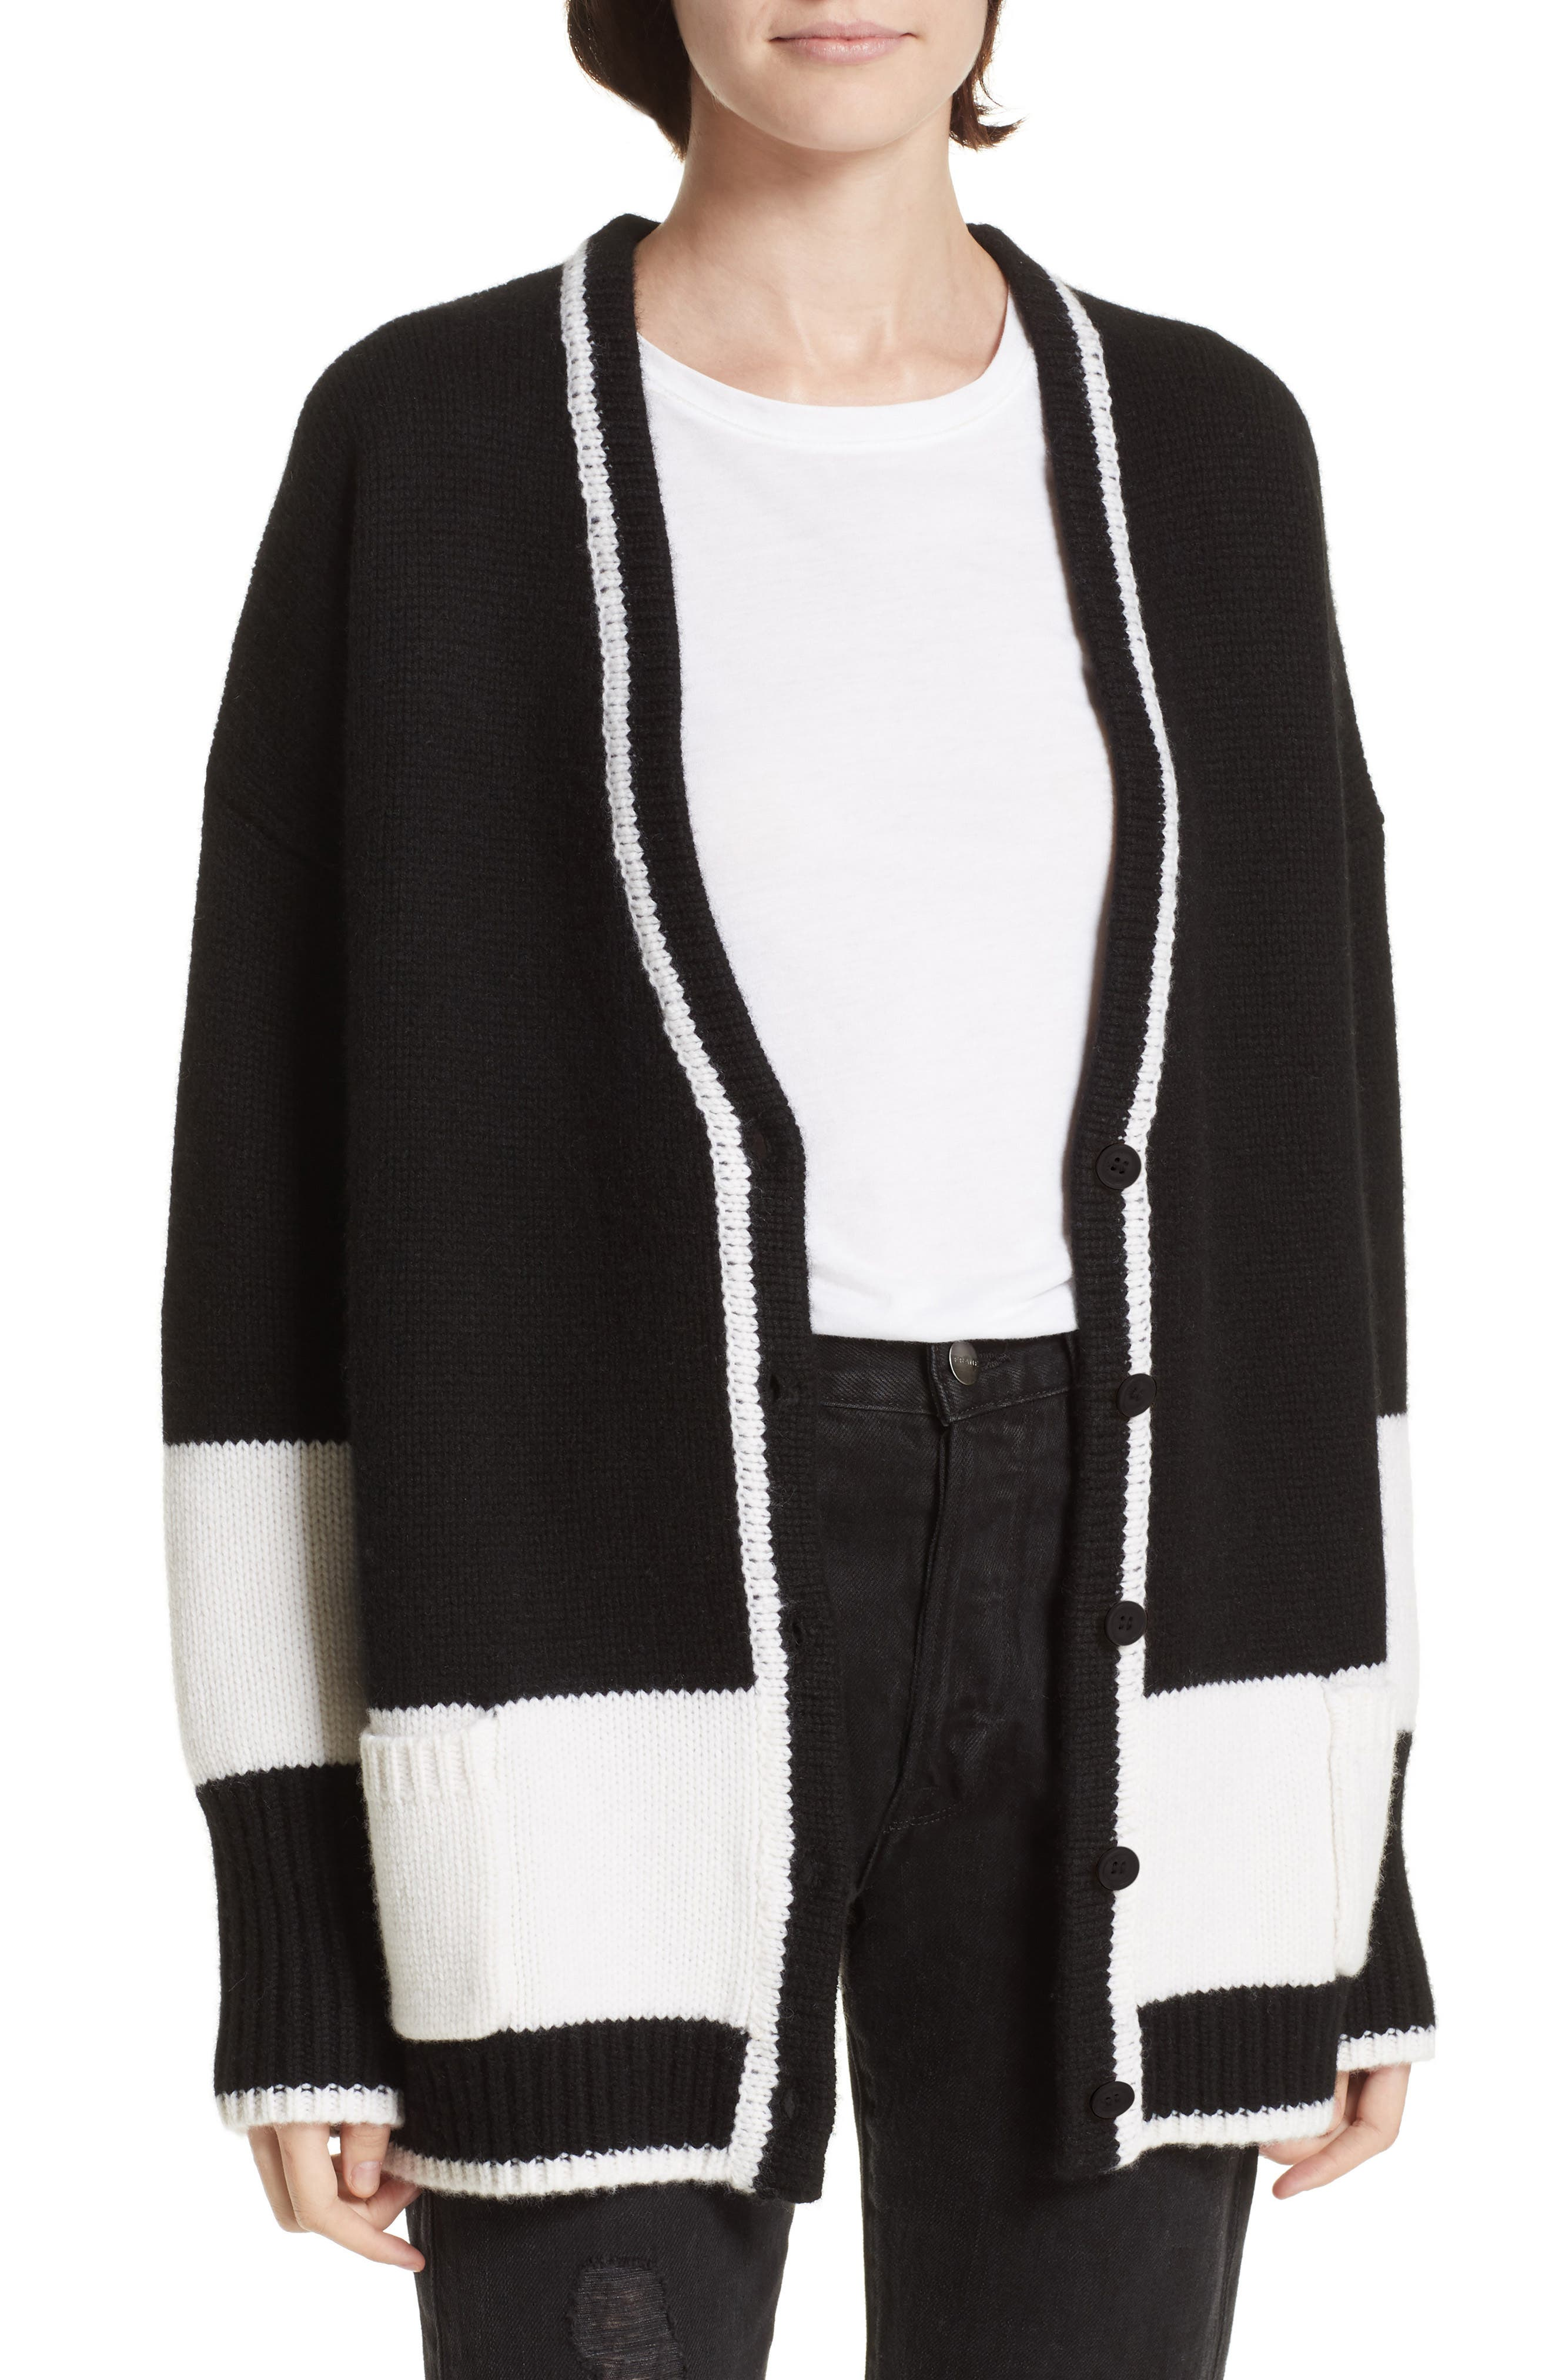 LA LIGNE Martha Wool & Cashmere Cardigan in Black/ Cream